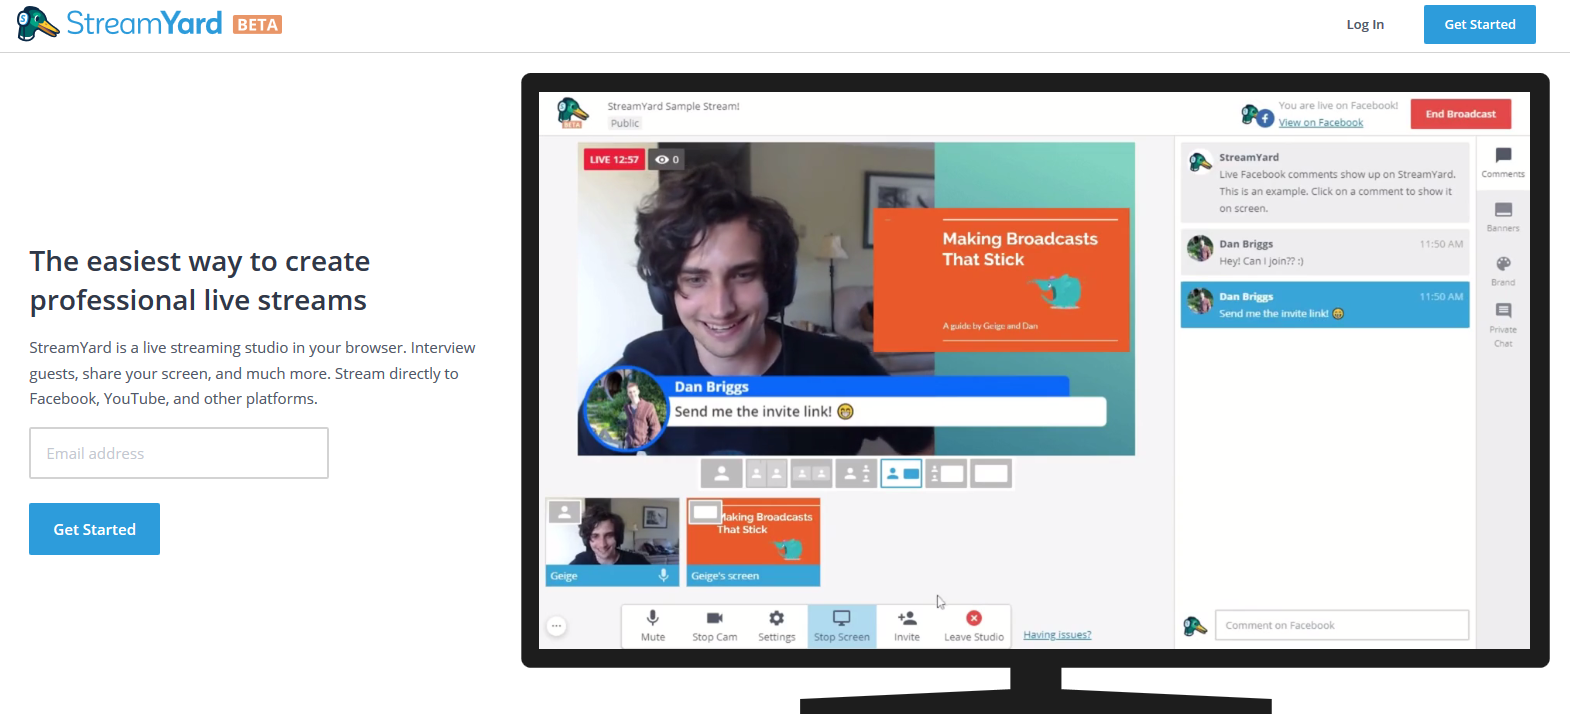 streamyard LinkedIn Live Streaming tool